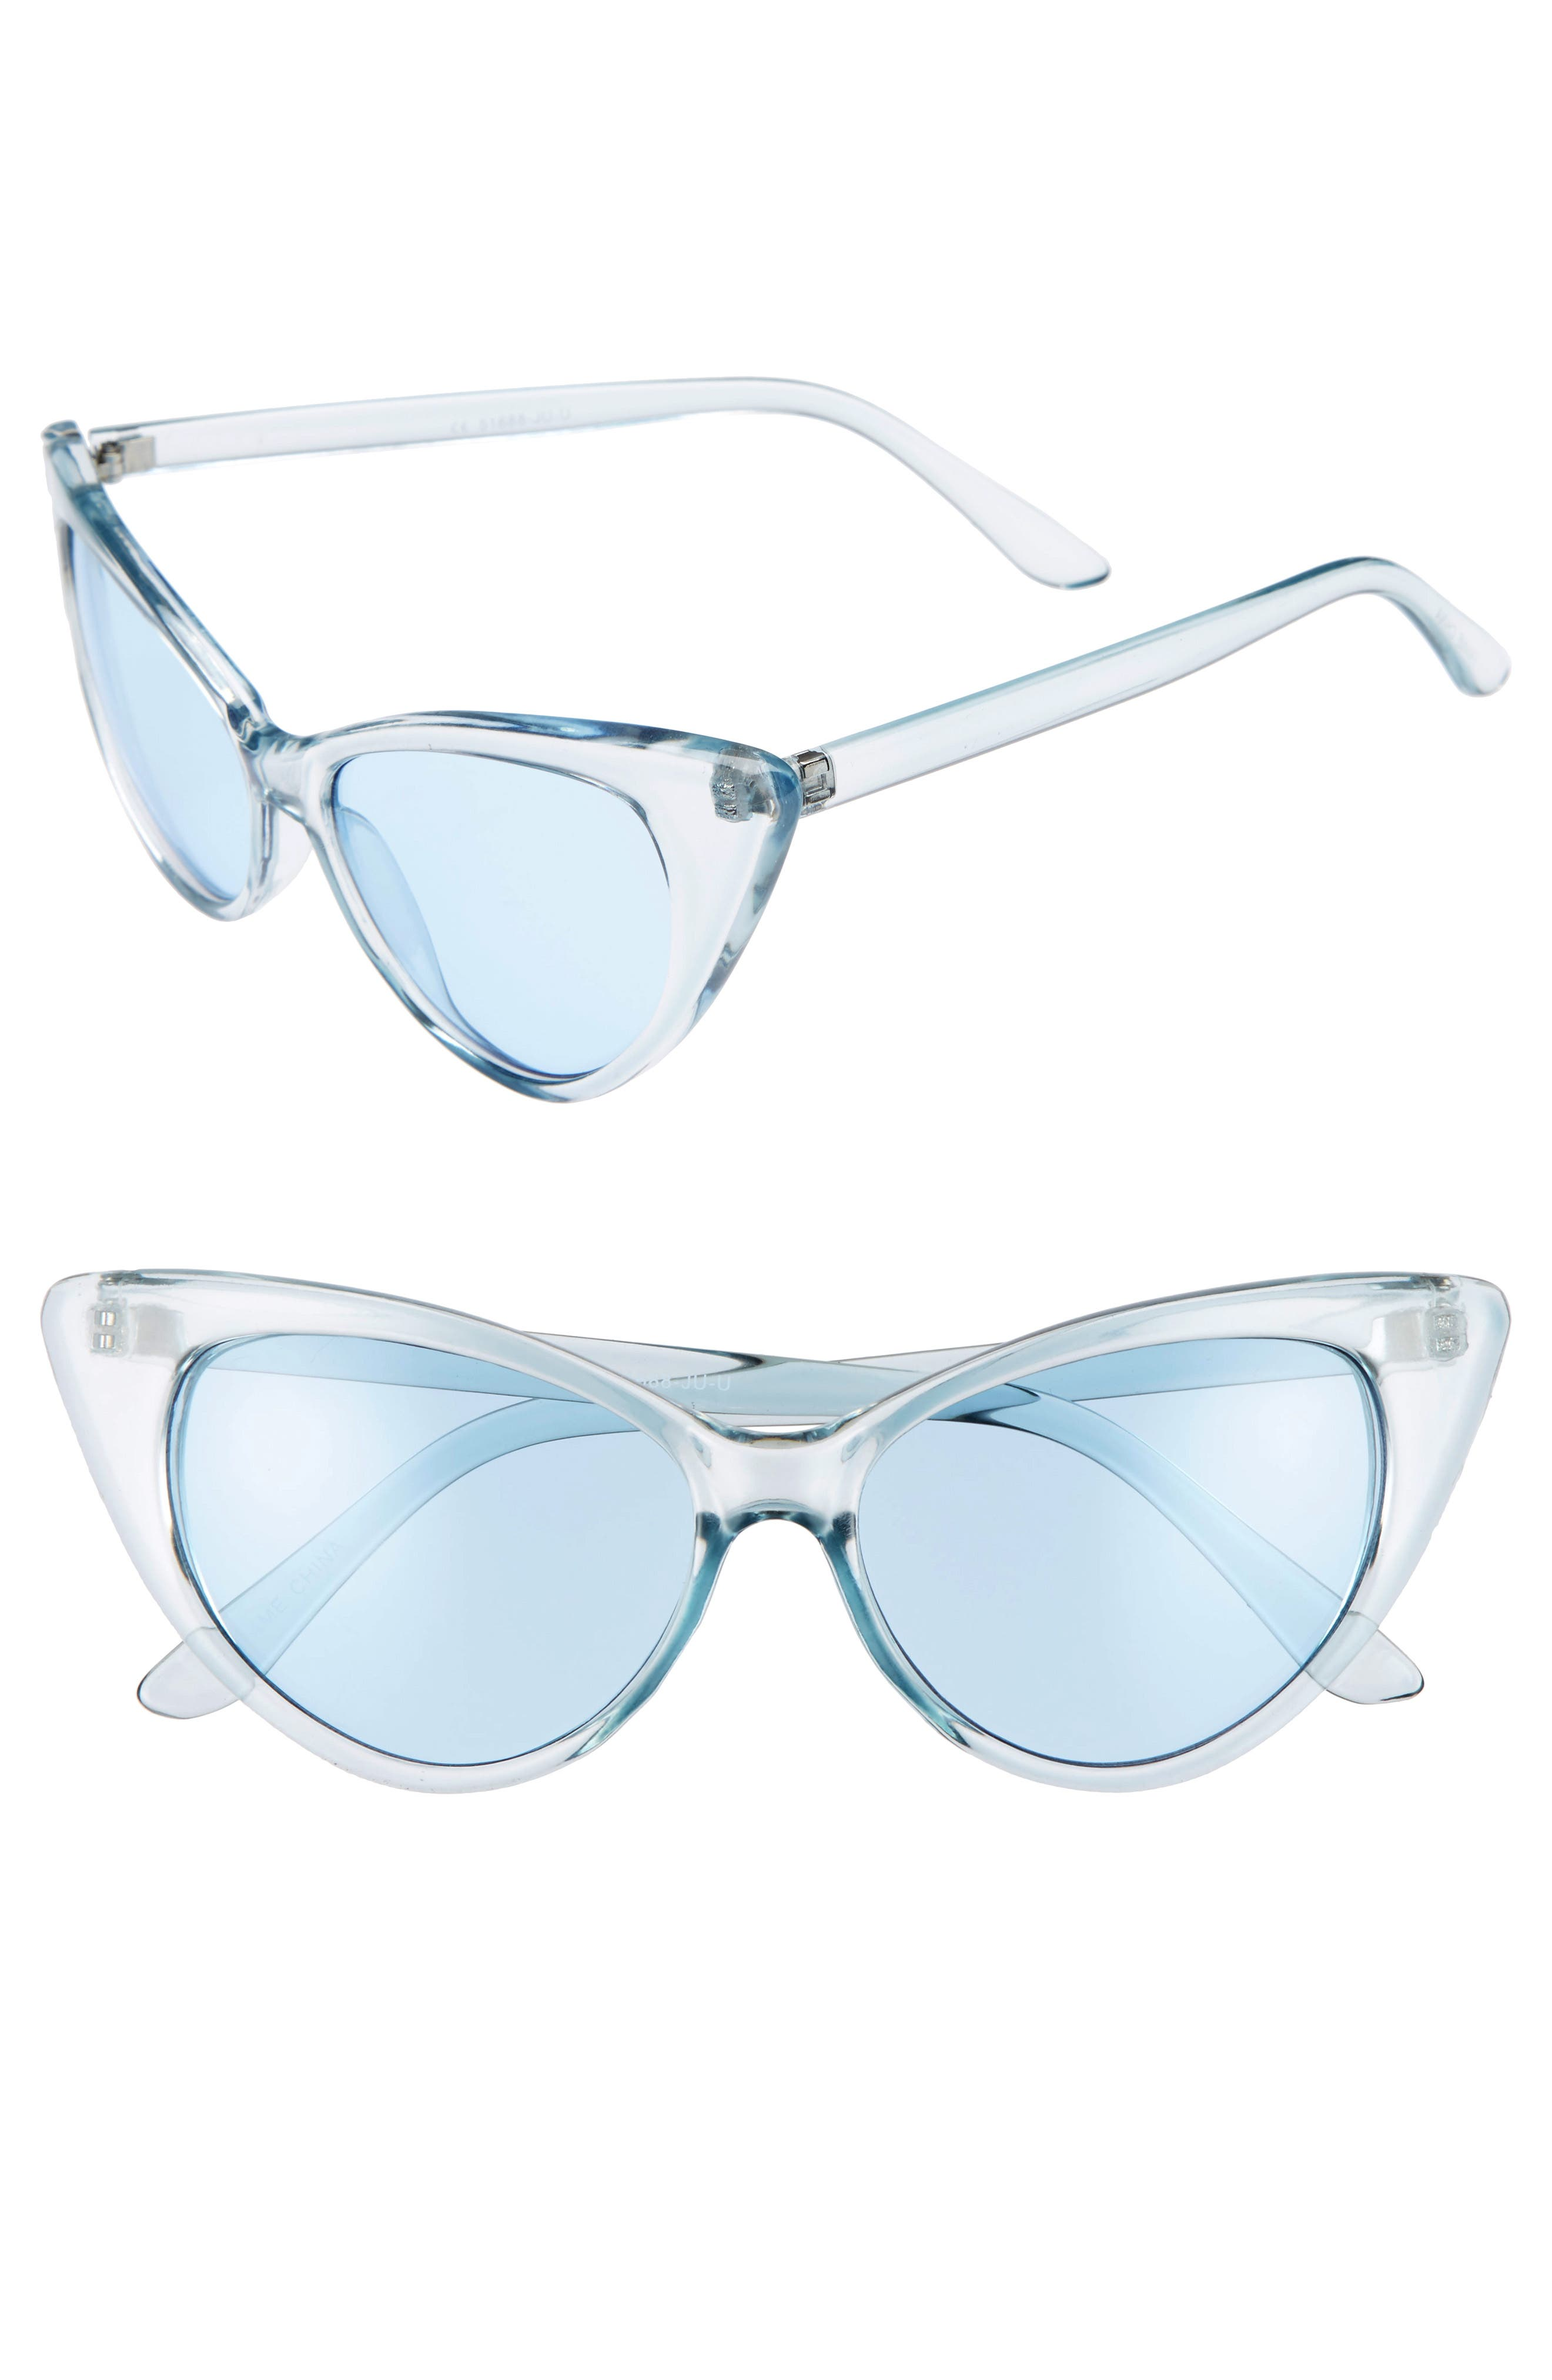 Glance Eyewear 55mm Transparent Pastel Cat Eye Sunglasses